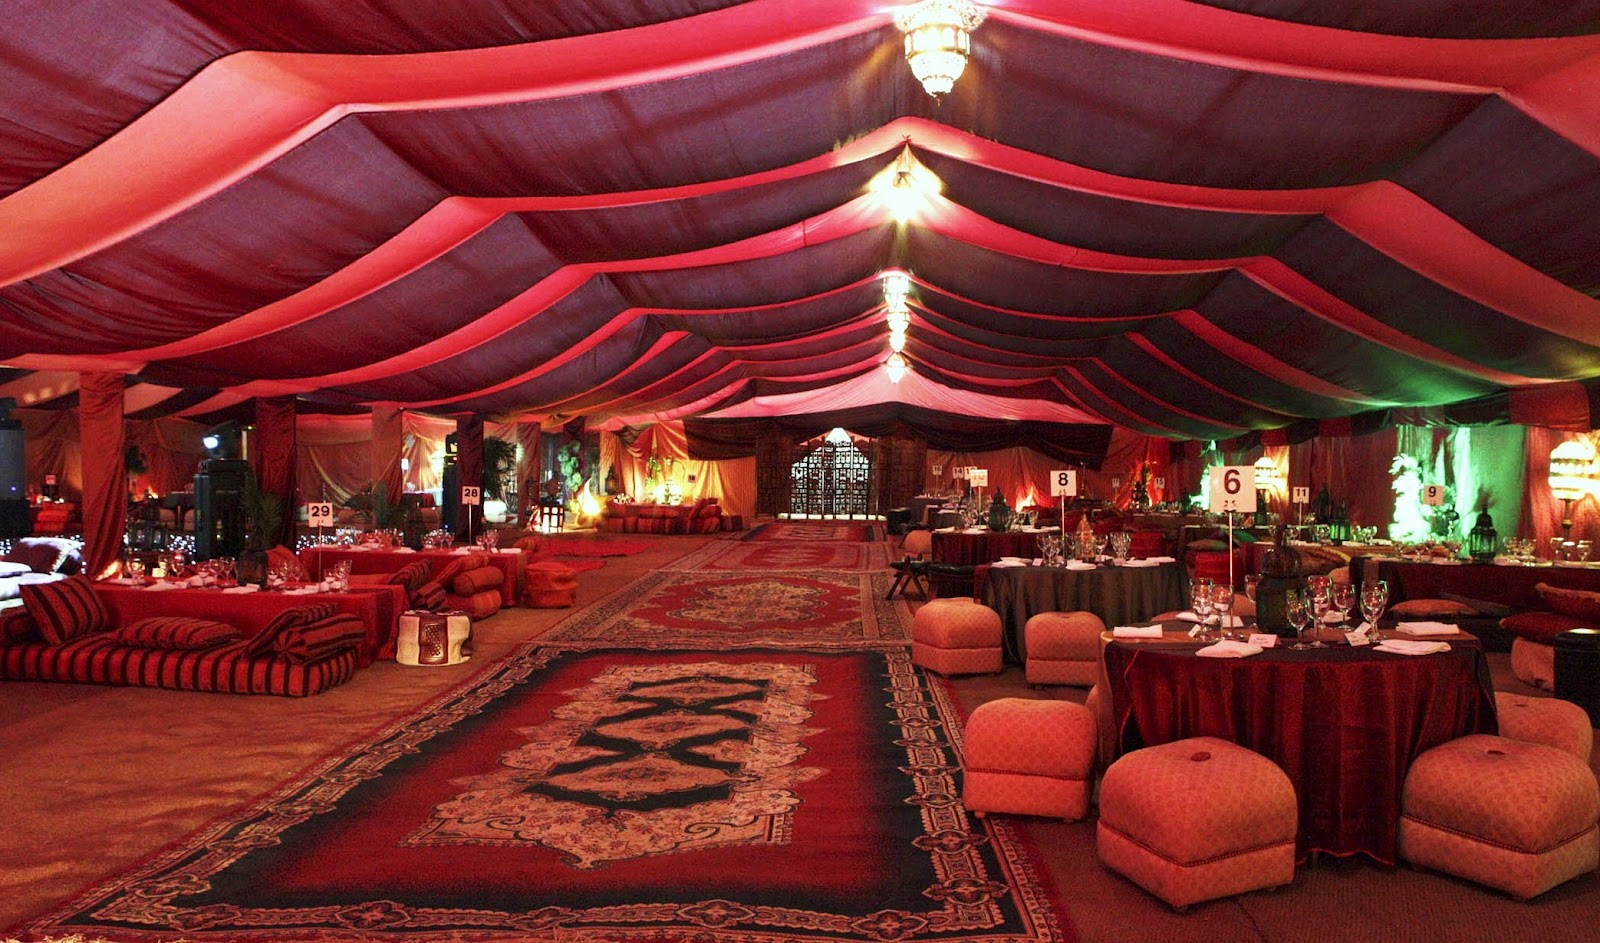 Wedding Themes Style Tent Decorating Ideas